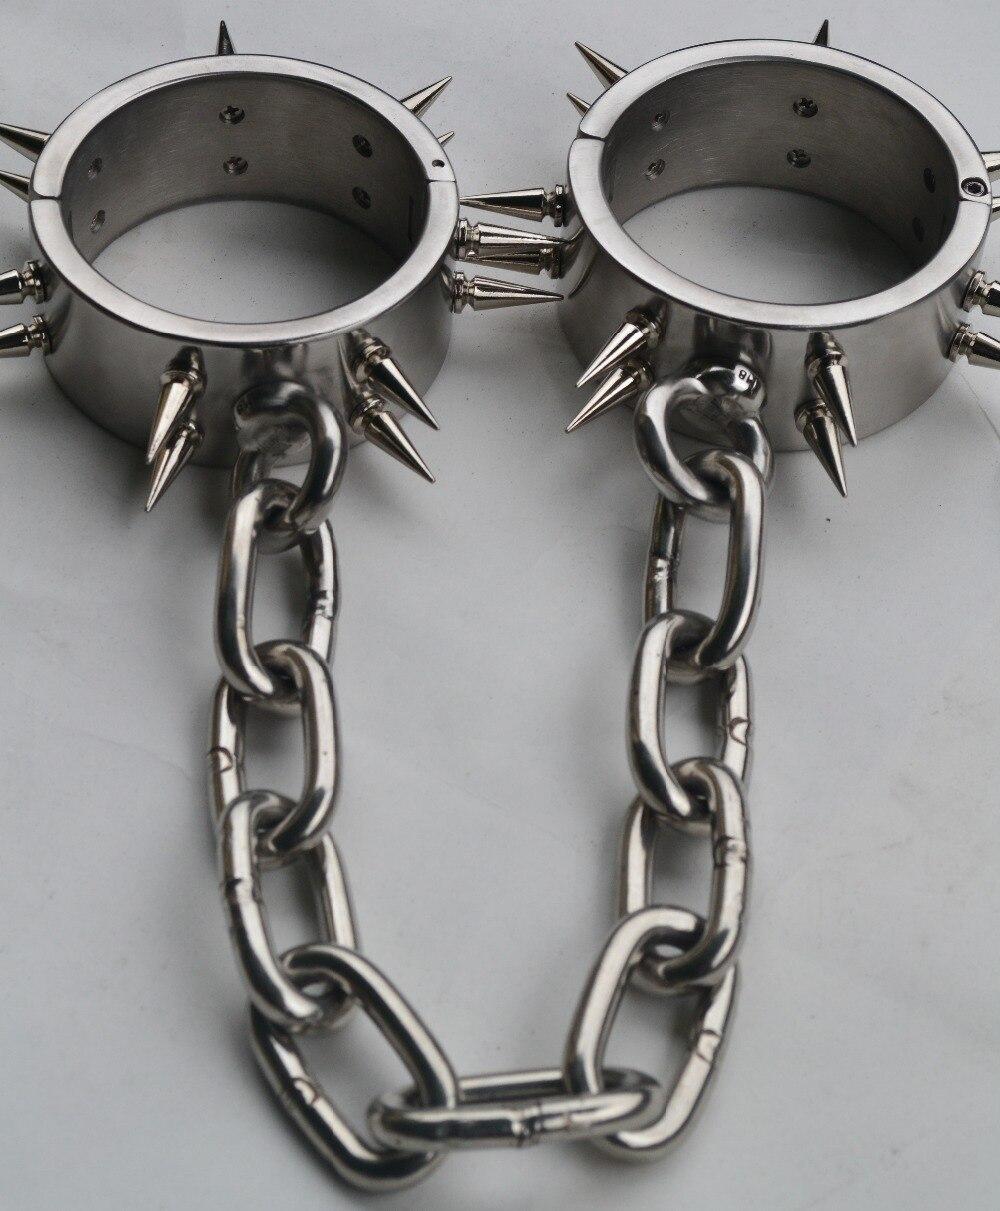 hot stainless steel fetish wear shackles sex slave legcuffs erotic toys bdsm bondage set Restraint harness bondage kit for man<br><br>Aliexpress